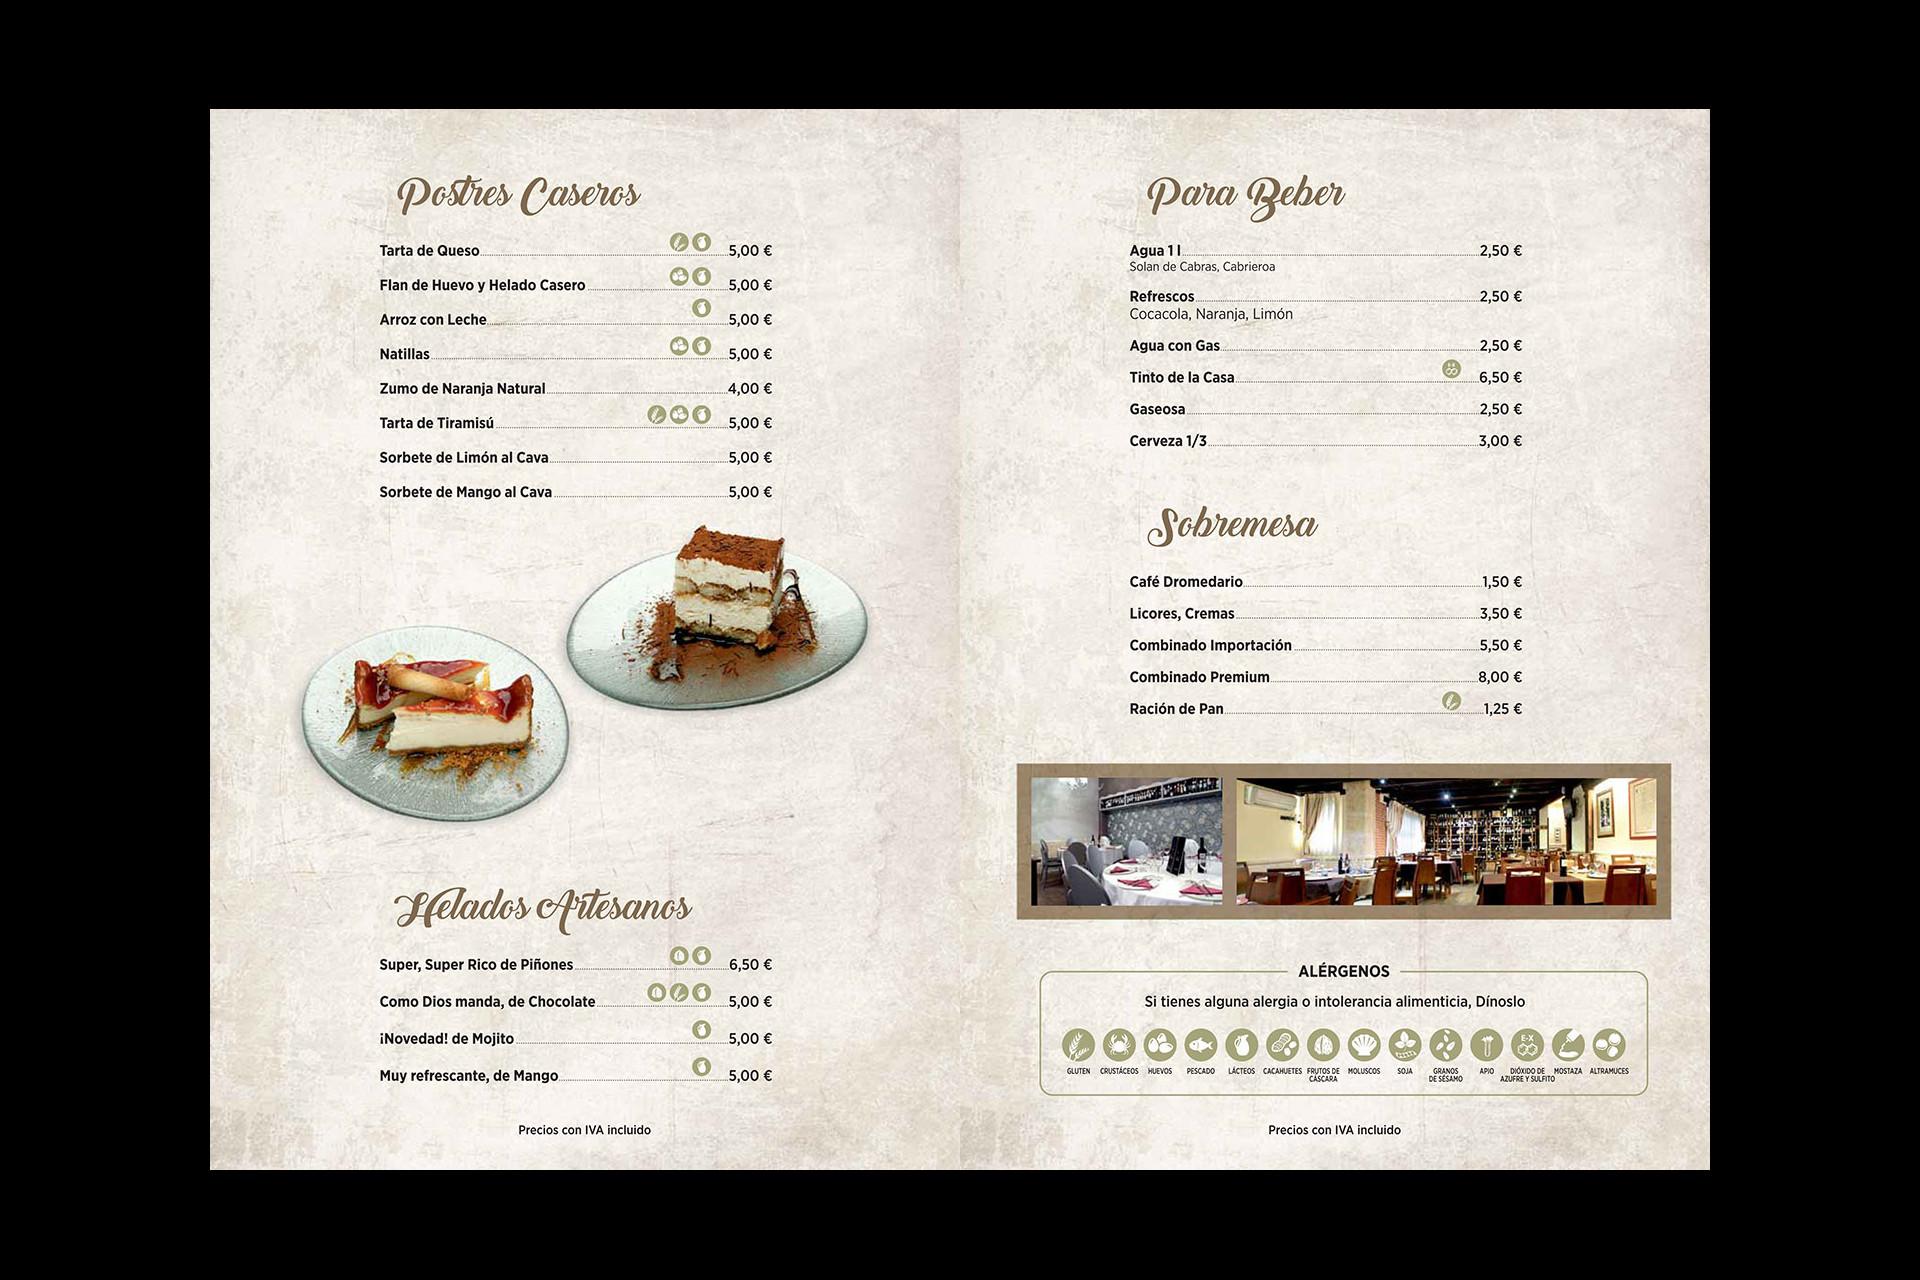 Carta restaurante con información alérgenos